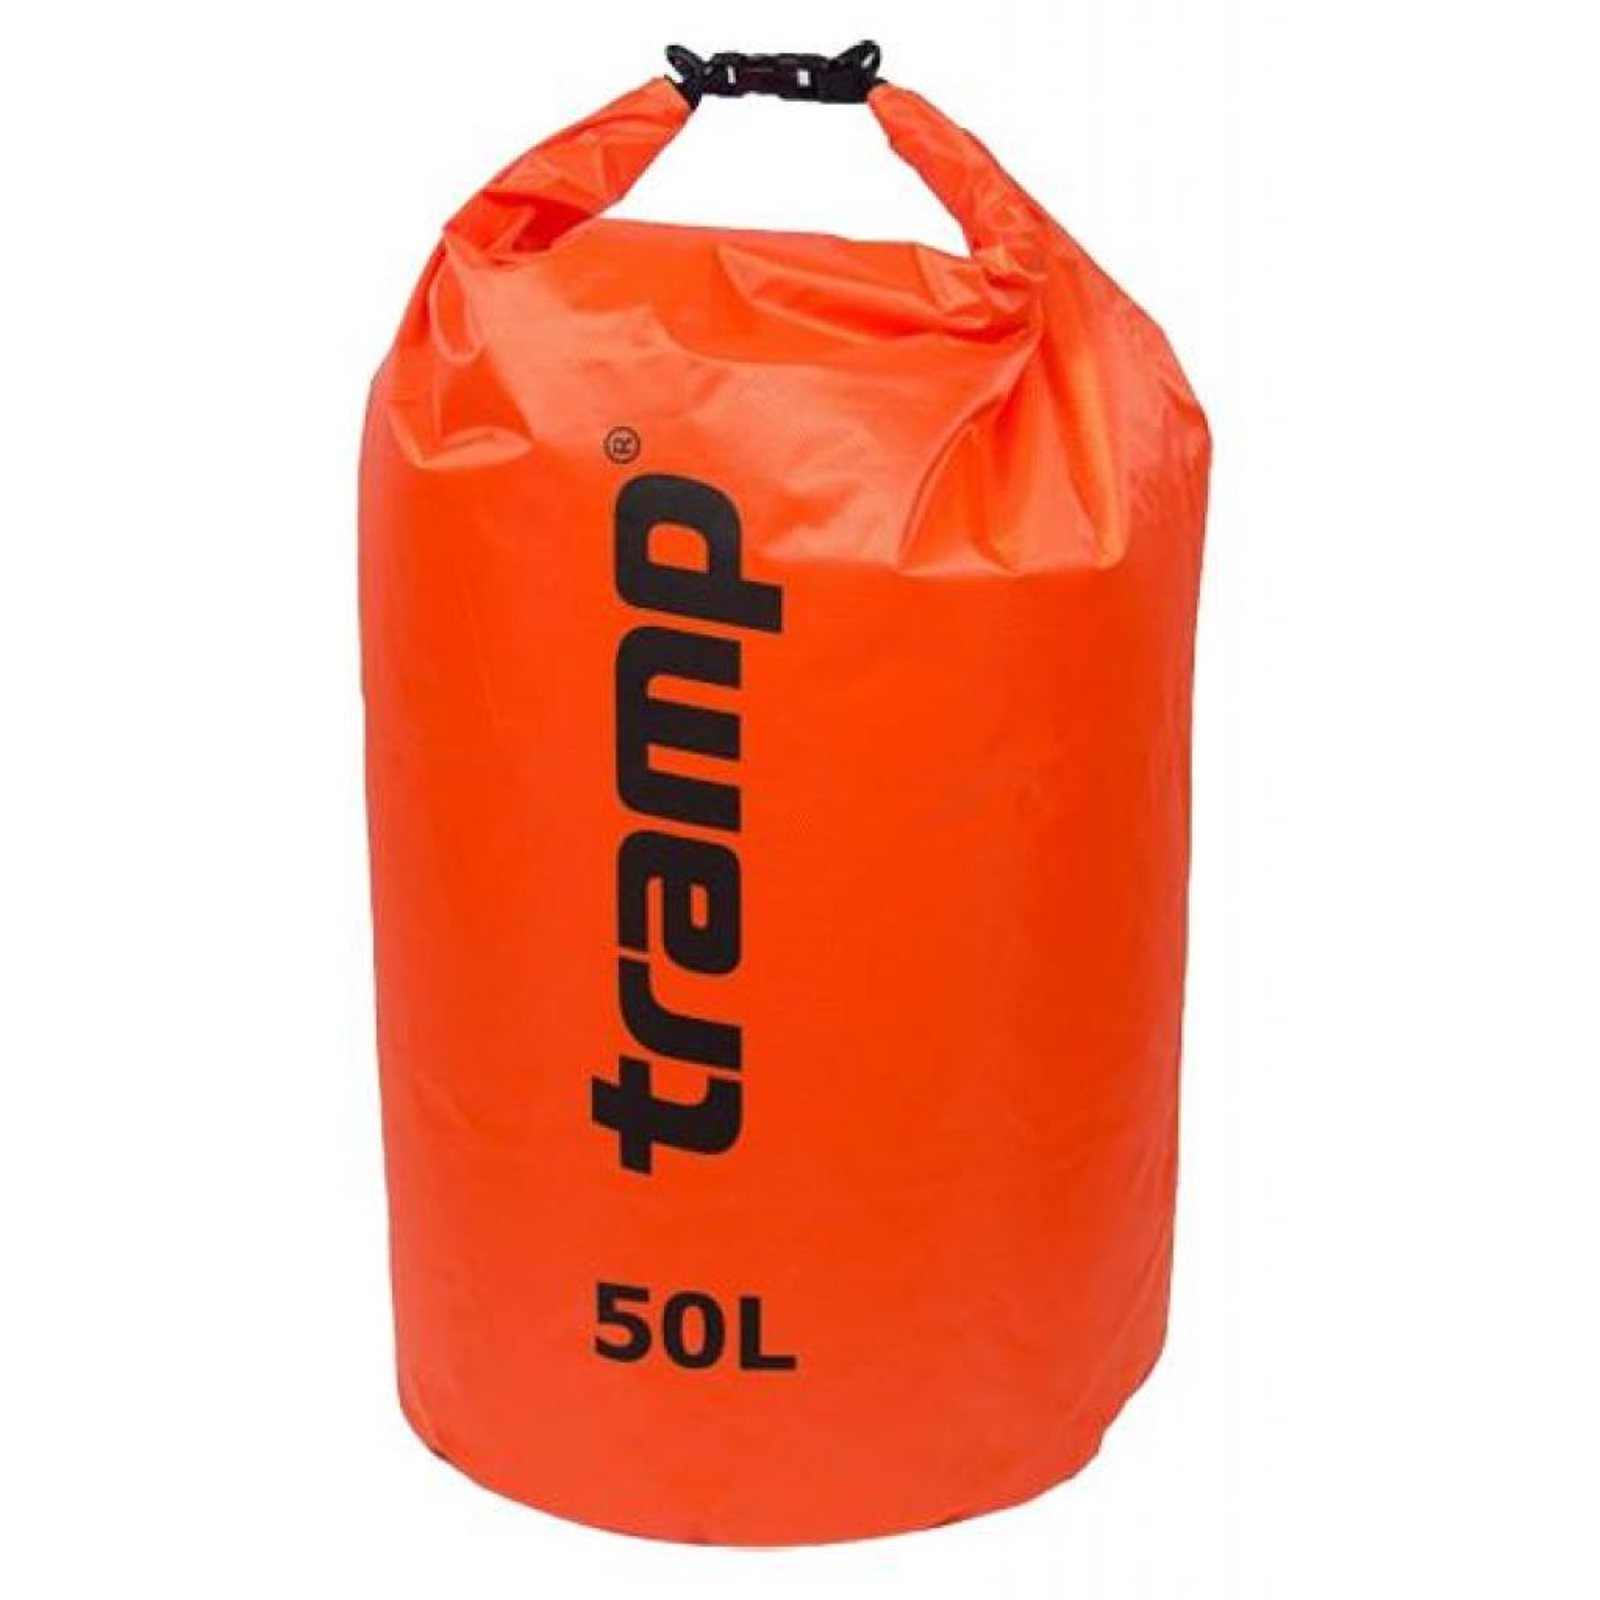 Гермомешок Tramp PVC Diamond Rip-Stop оранжевый 50л (TRA-208-orange)